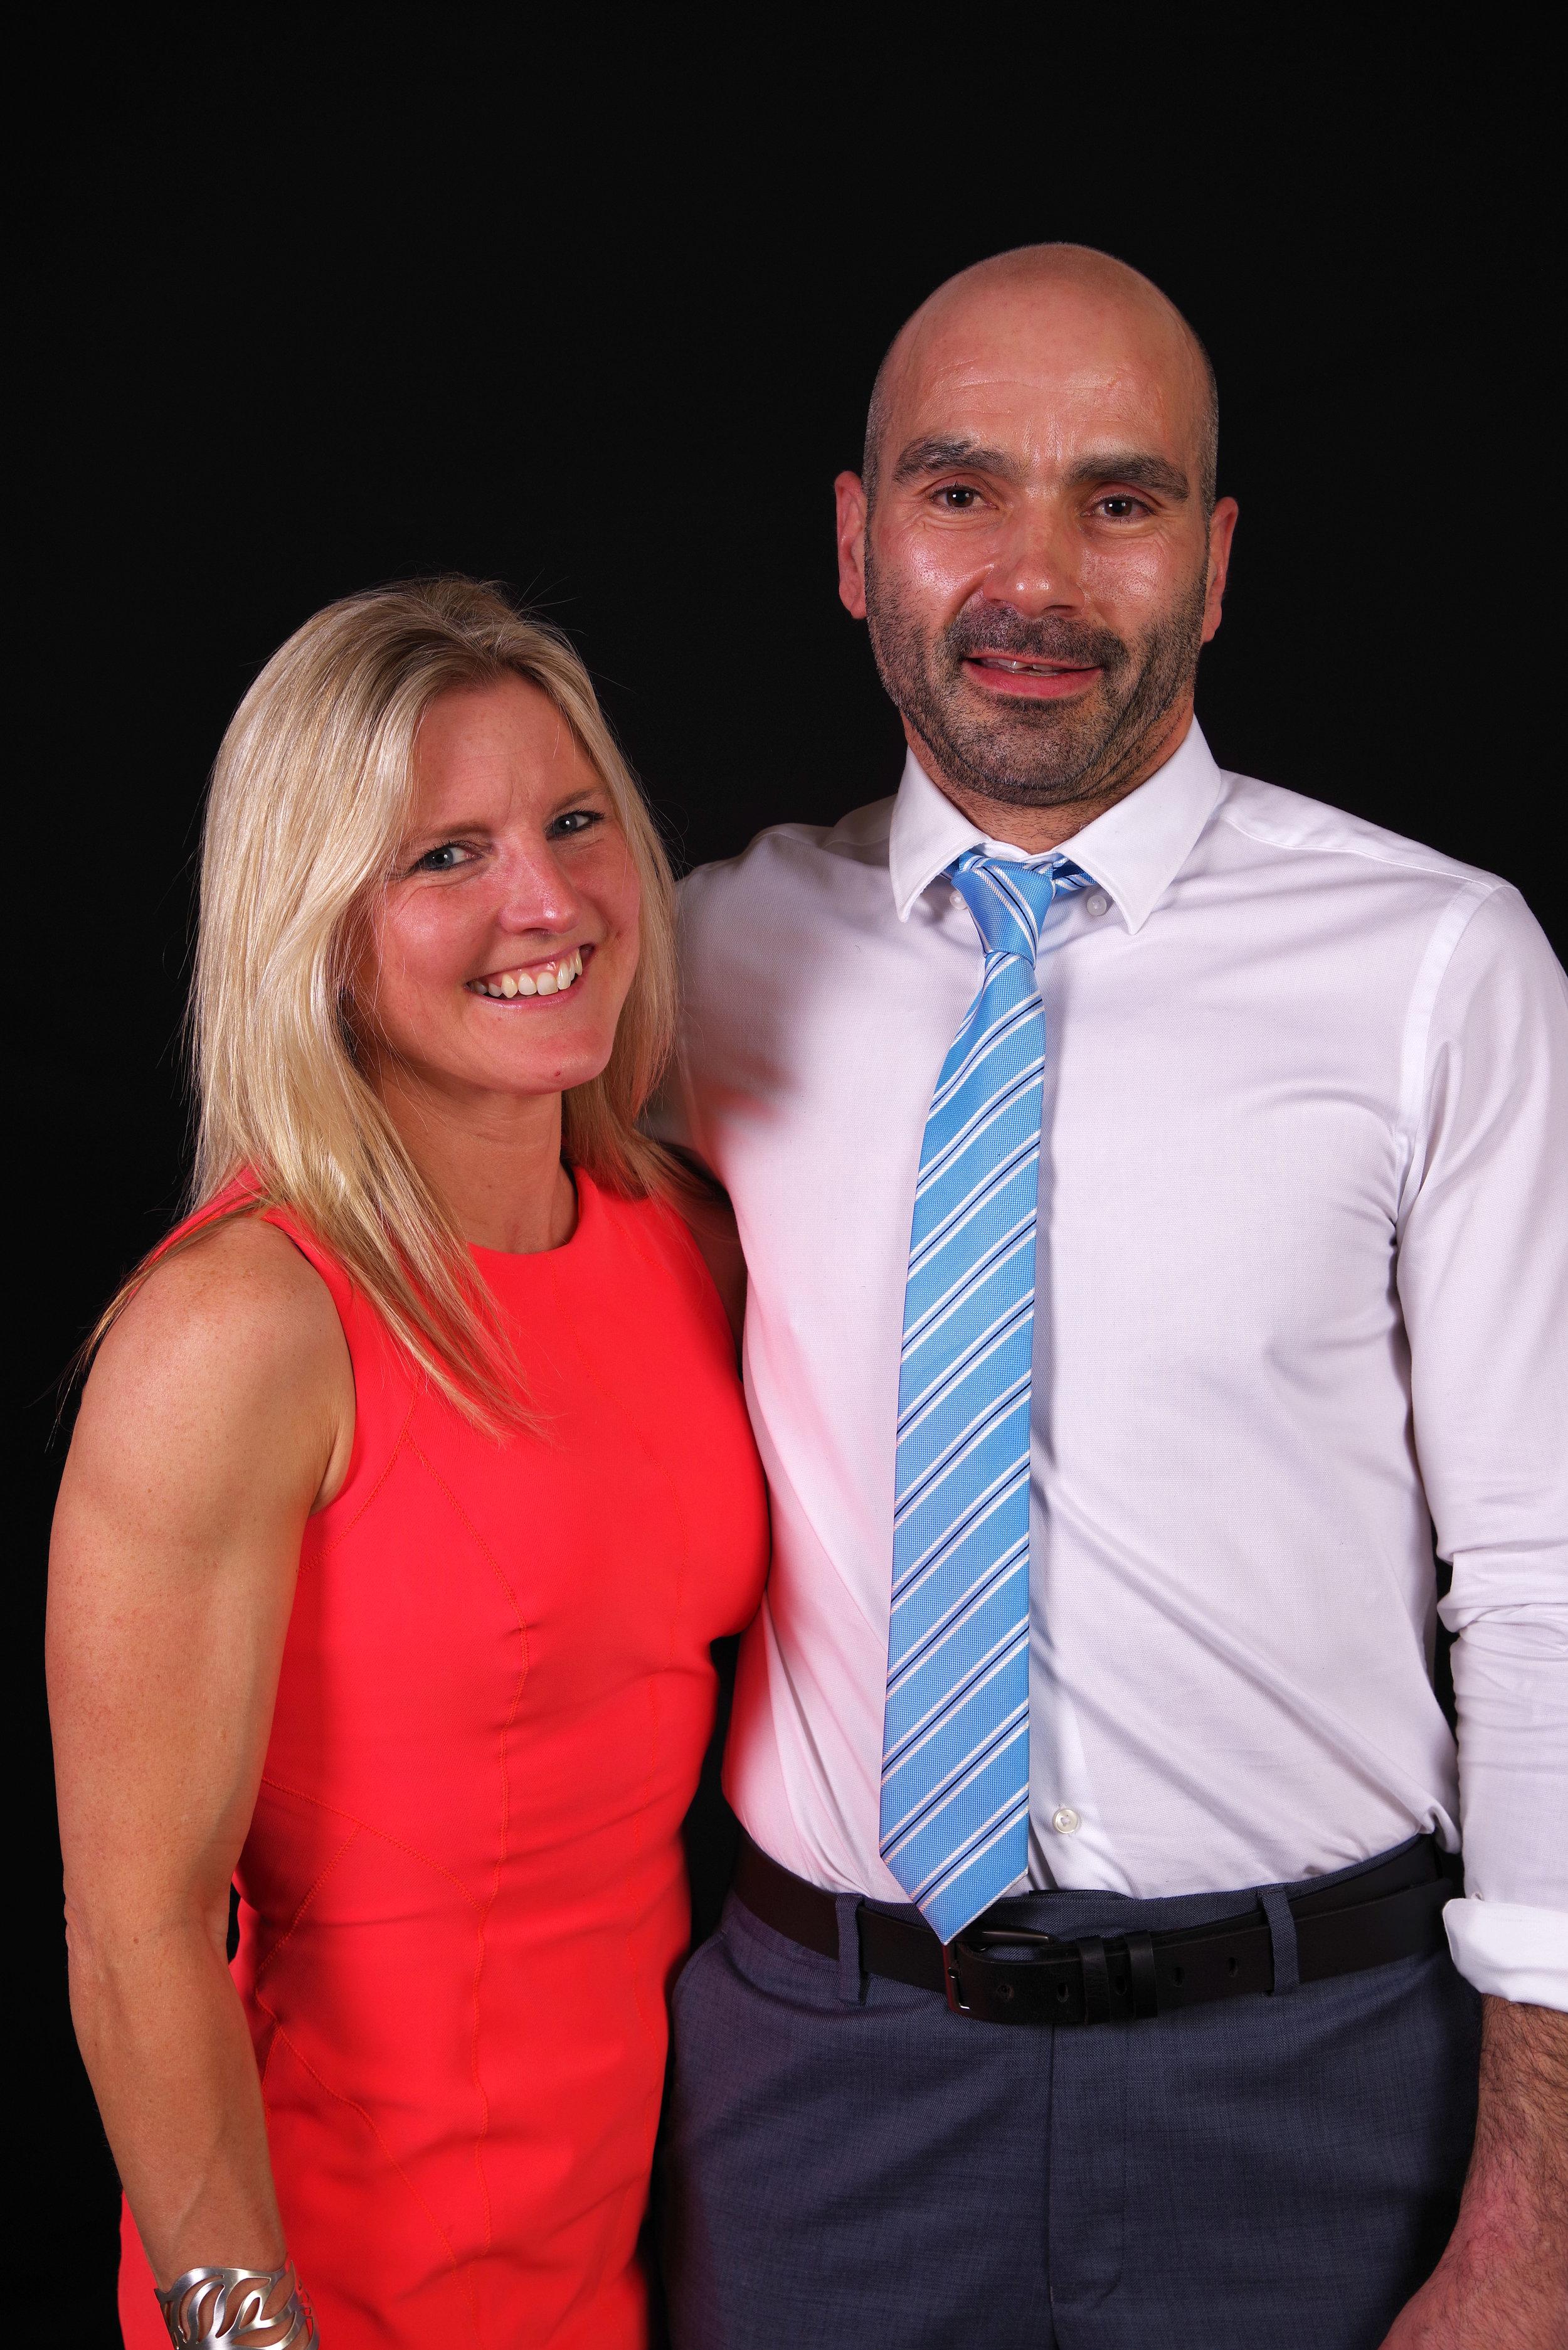 Tanya Blake & Mark Pigford - Coaches Extraordinaire